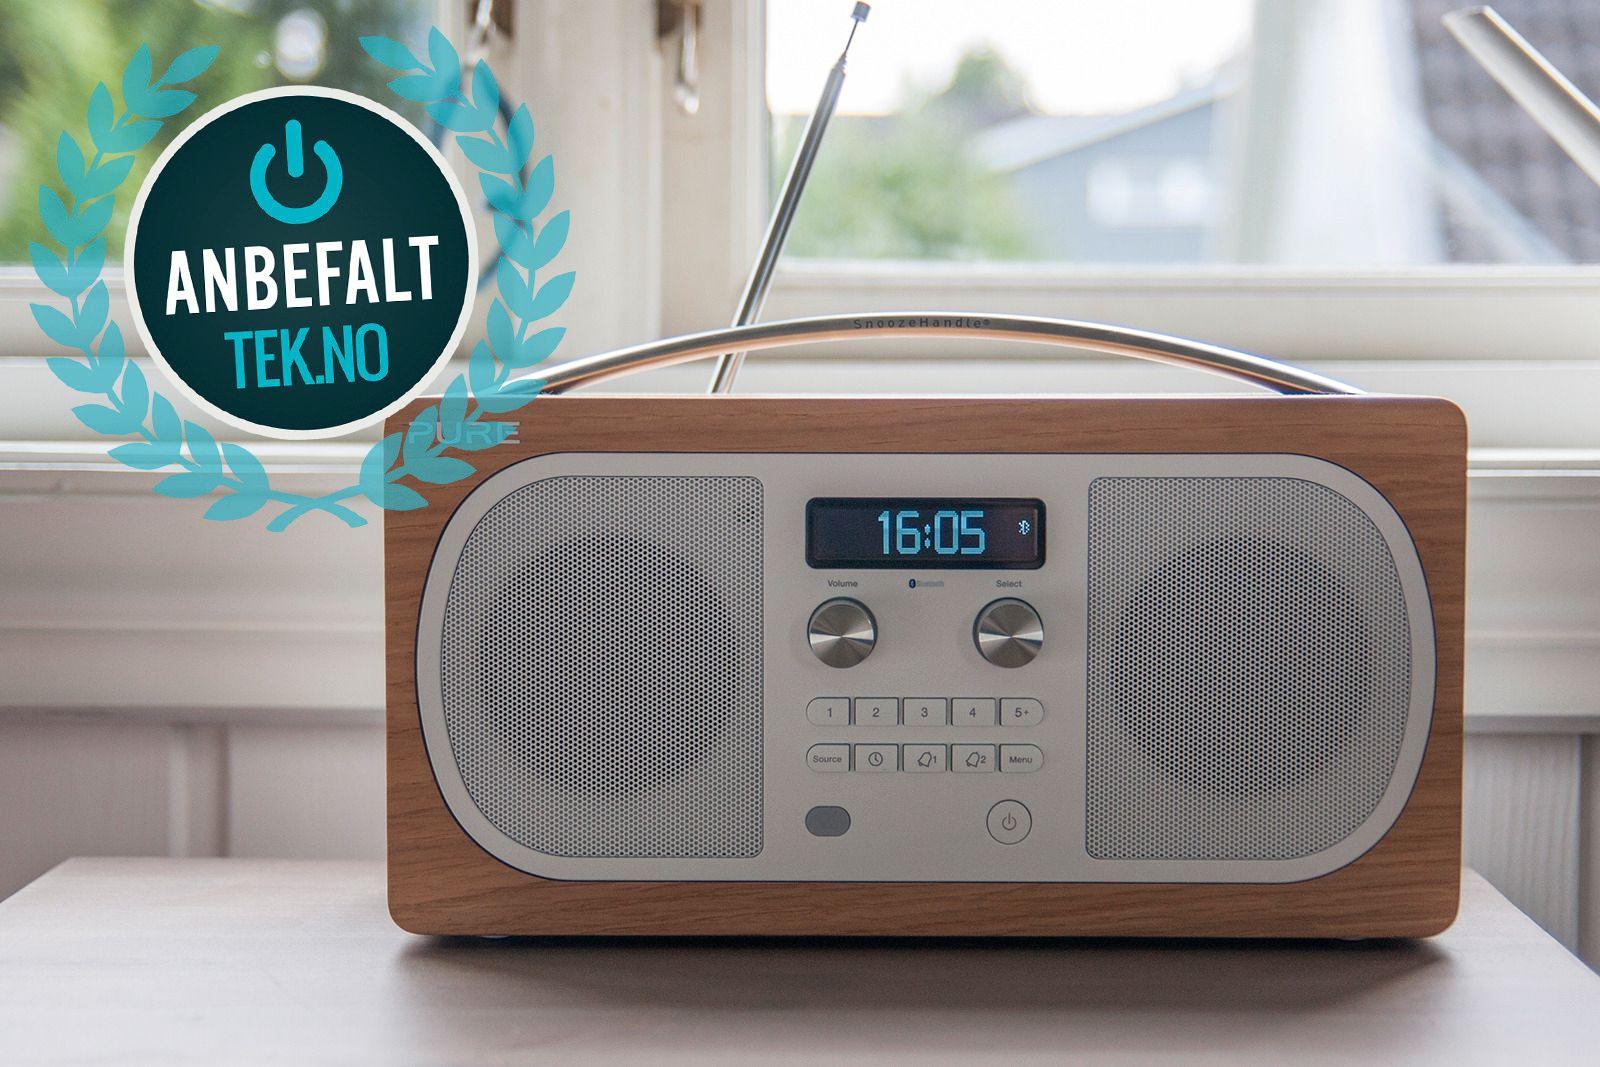 Hvis du ser etter en enkel, men pen radio, er Pure Evoke D6 et godt valg. Foto: Kristoffer Møllevik/Tek.no